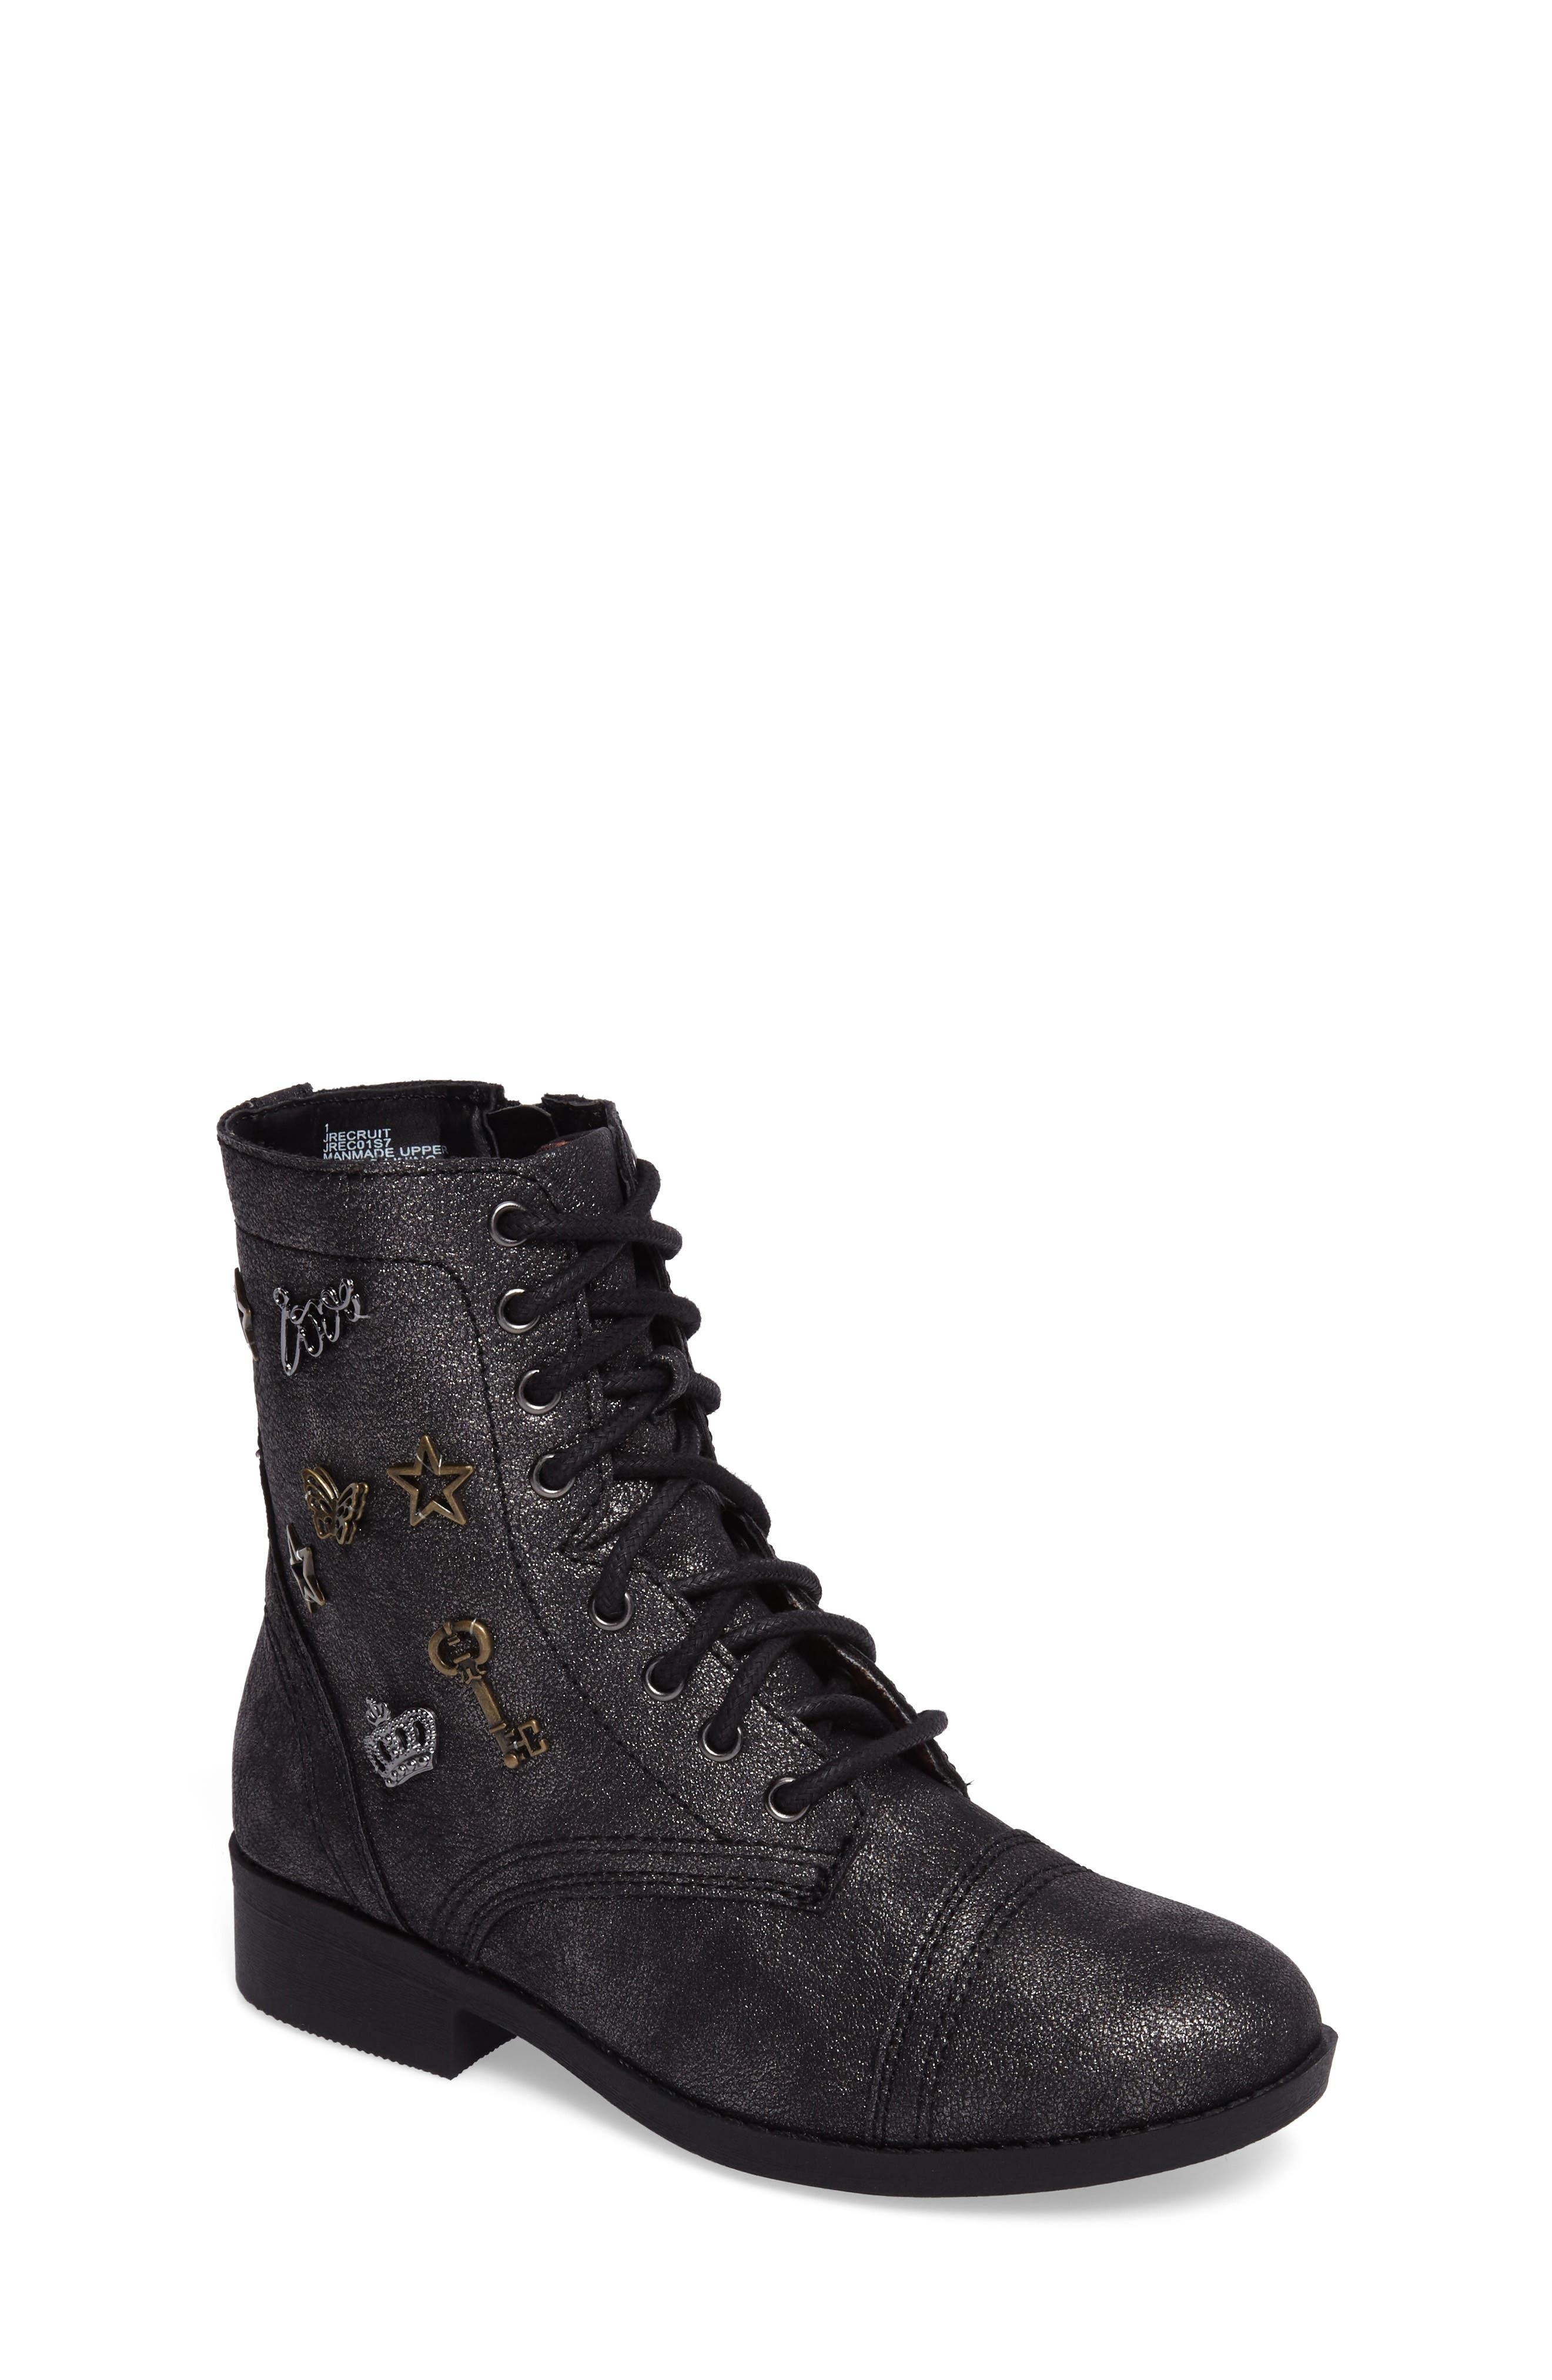 JRecruit Charm Boot,                         Main,                         color, 019